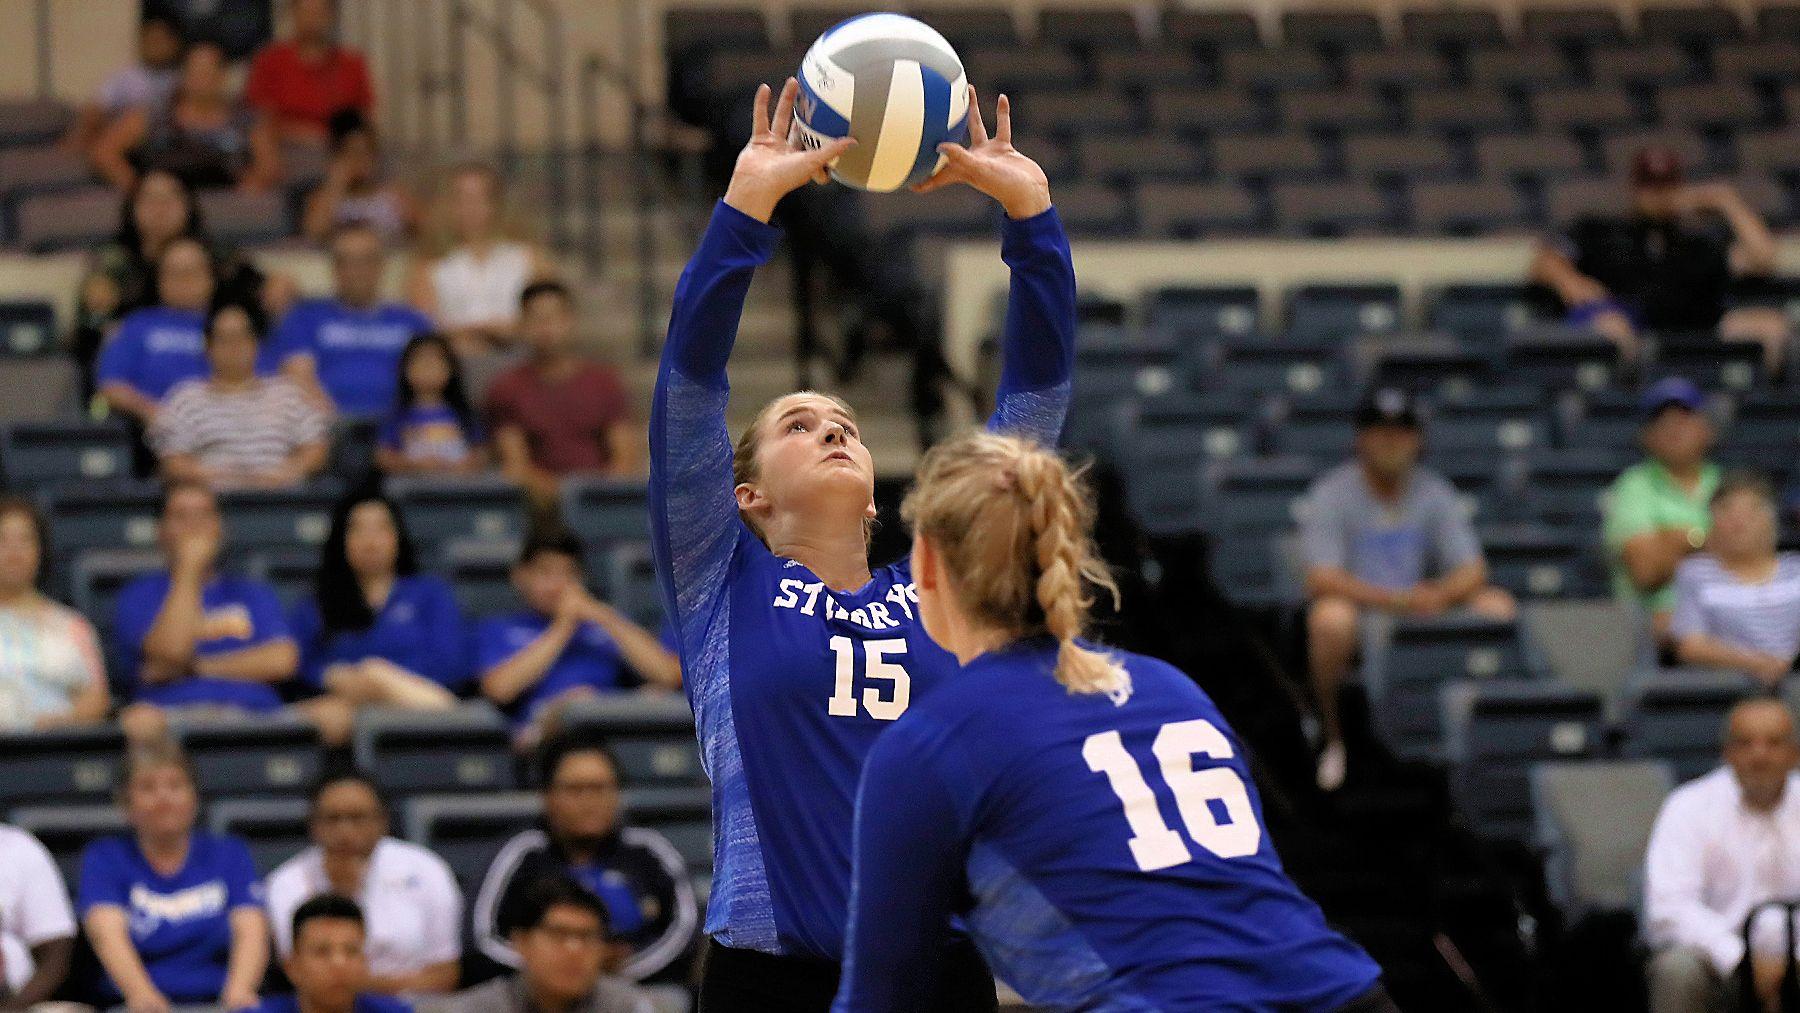 Stmu Volleyball S Win Streak Over Texas A M Int L Dustdevils Athlete Volleyballs Streak